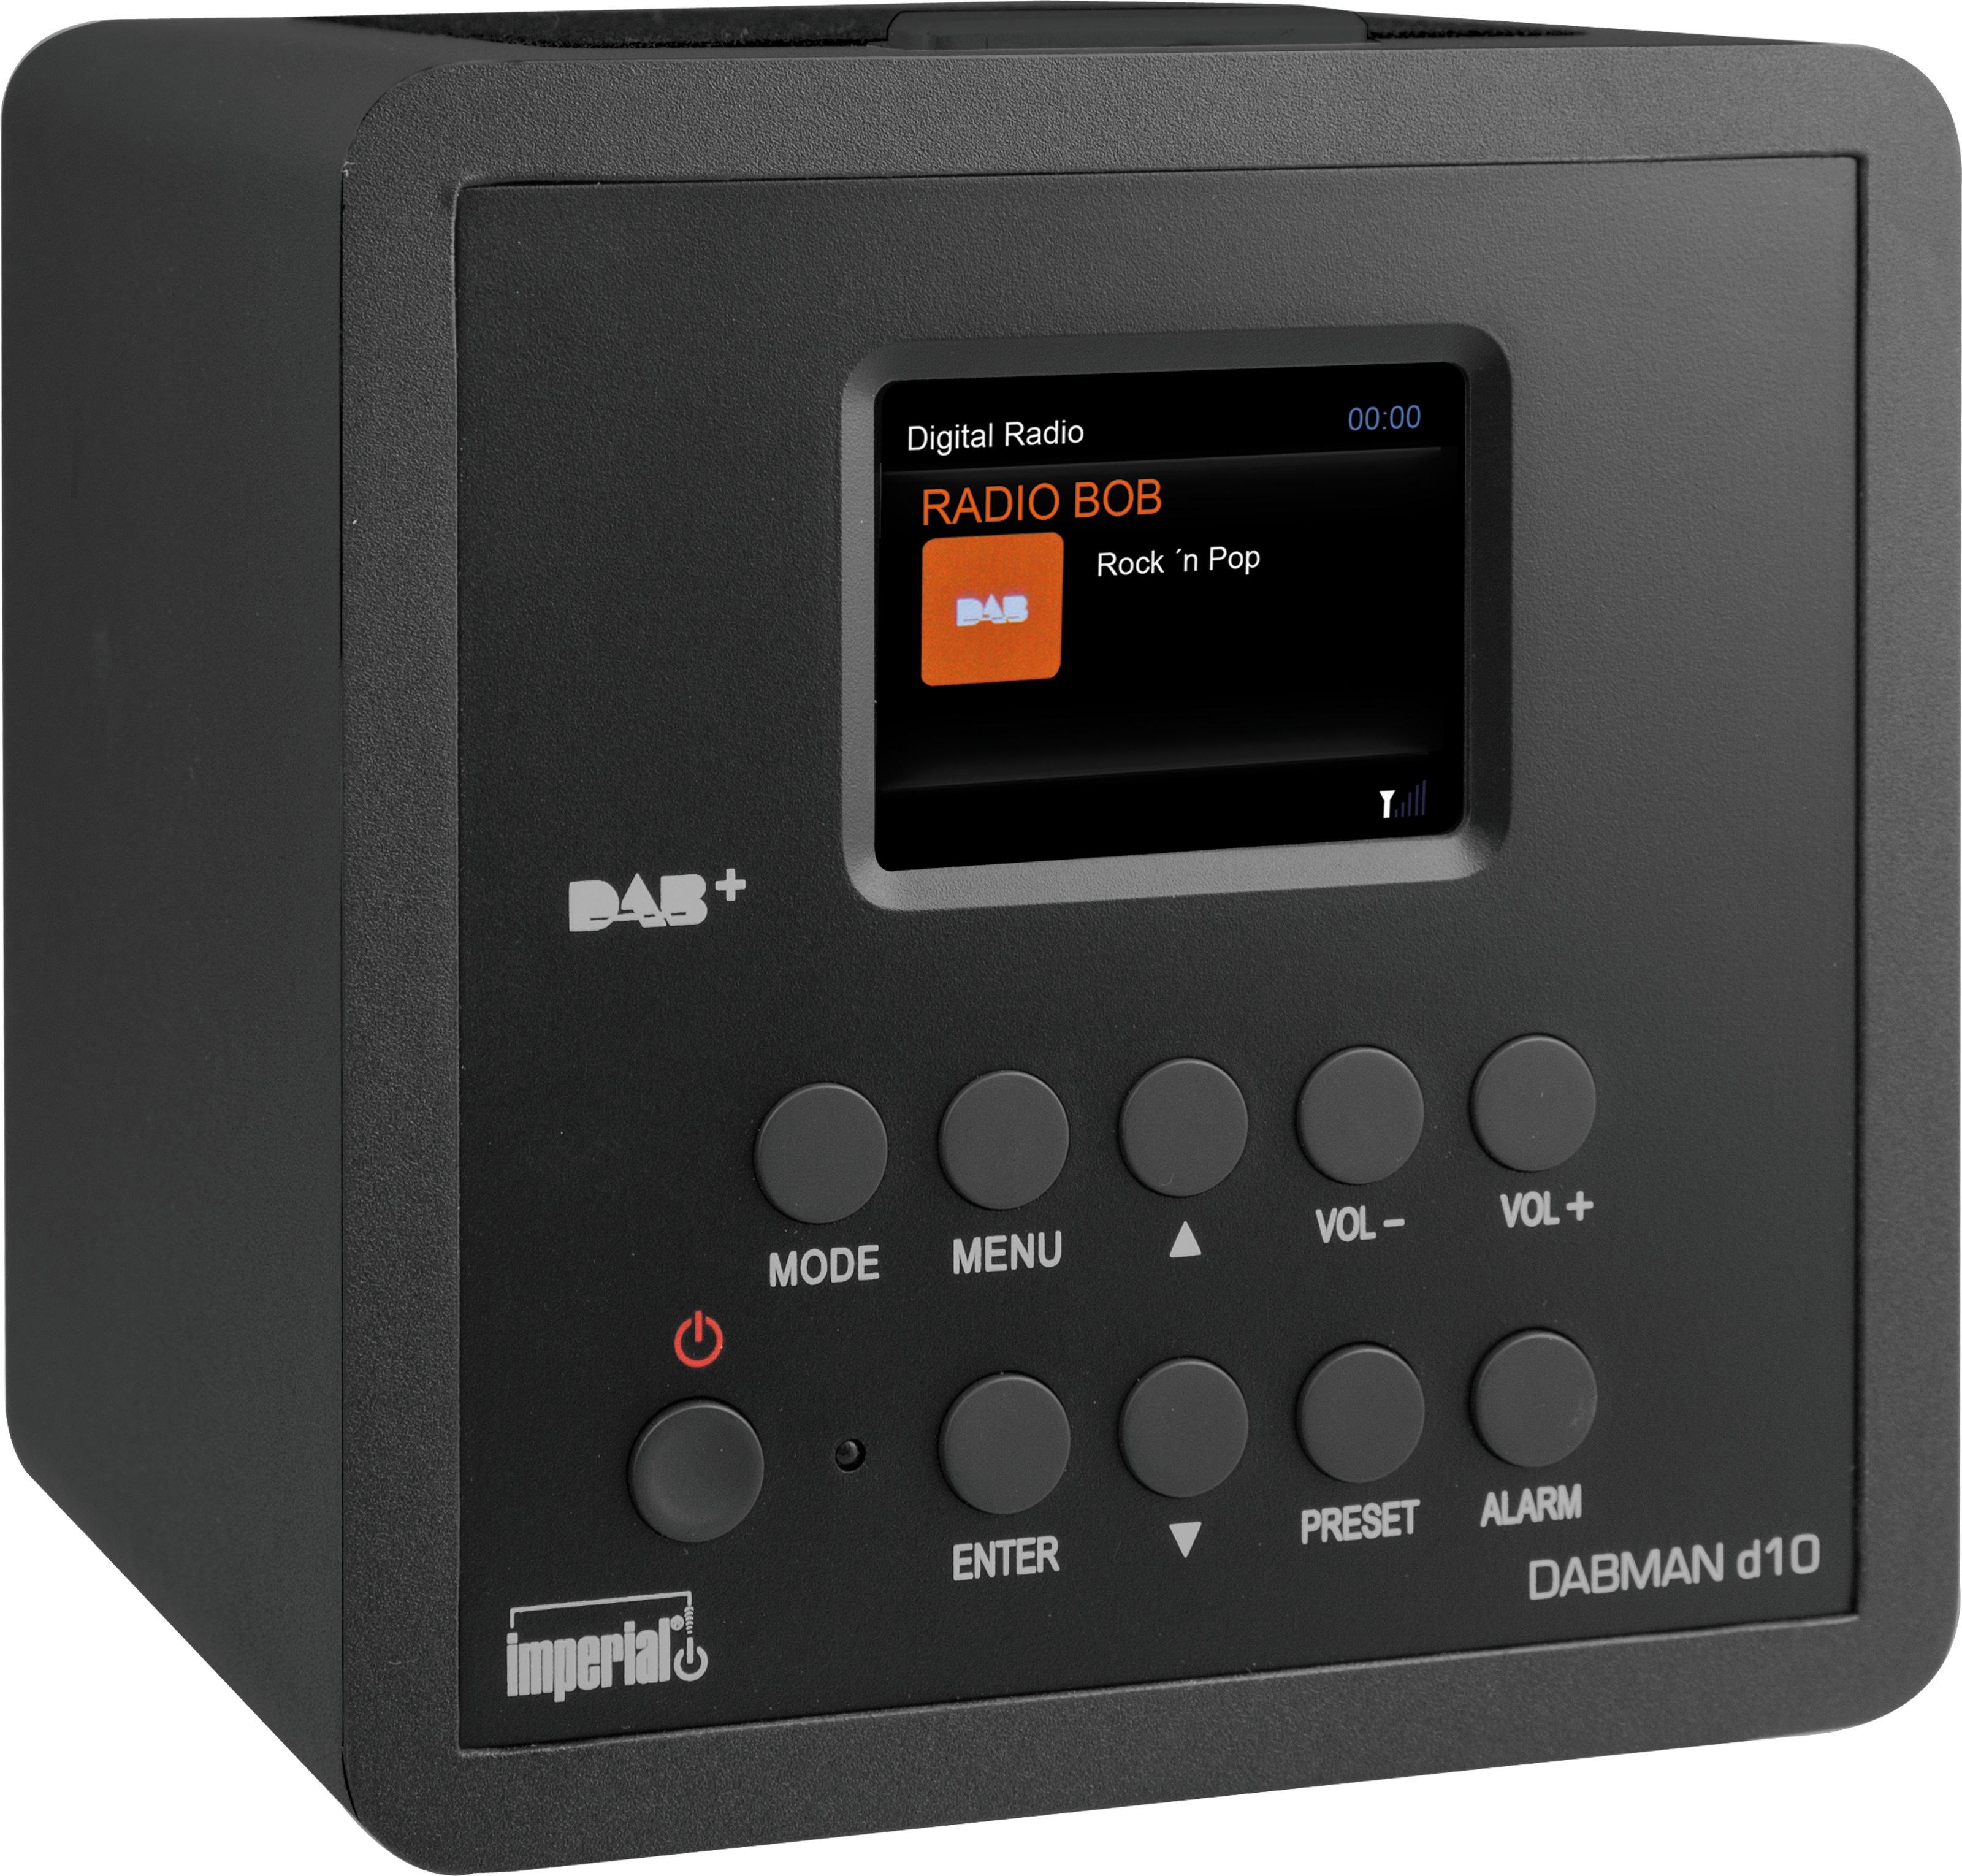 Telestar DABMAN d10 - Tragbar - Analog & Digital - DAB+,FM - 4 W - TFT - 6,1 cm (2.4 Zoll)